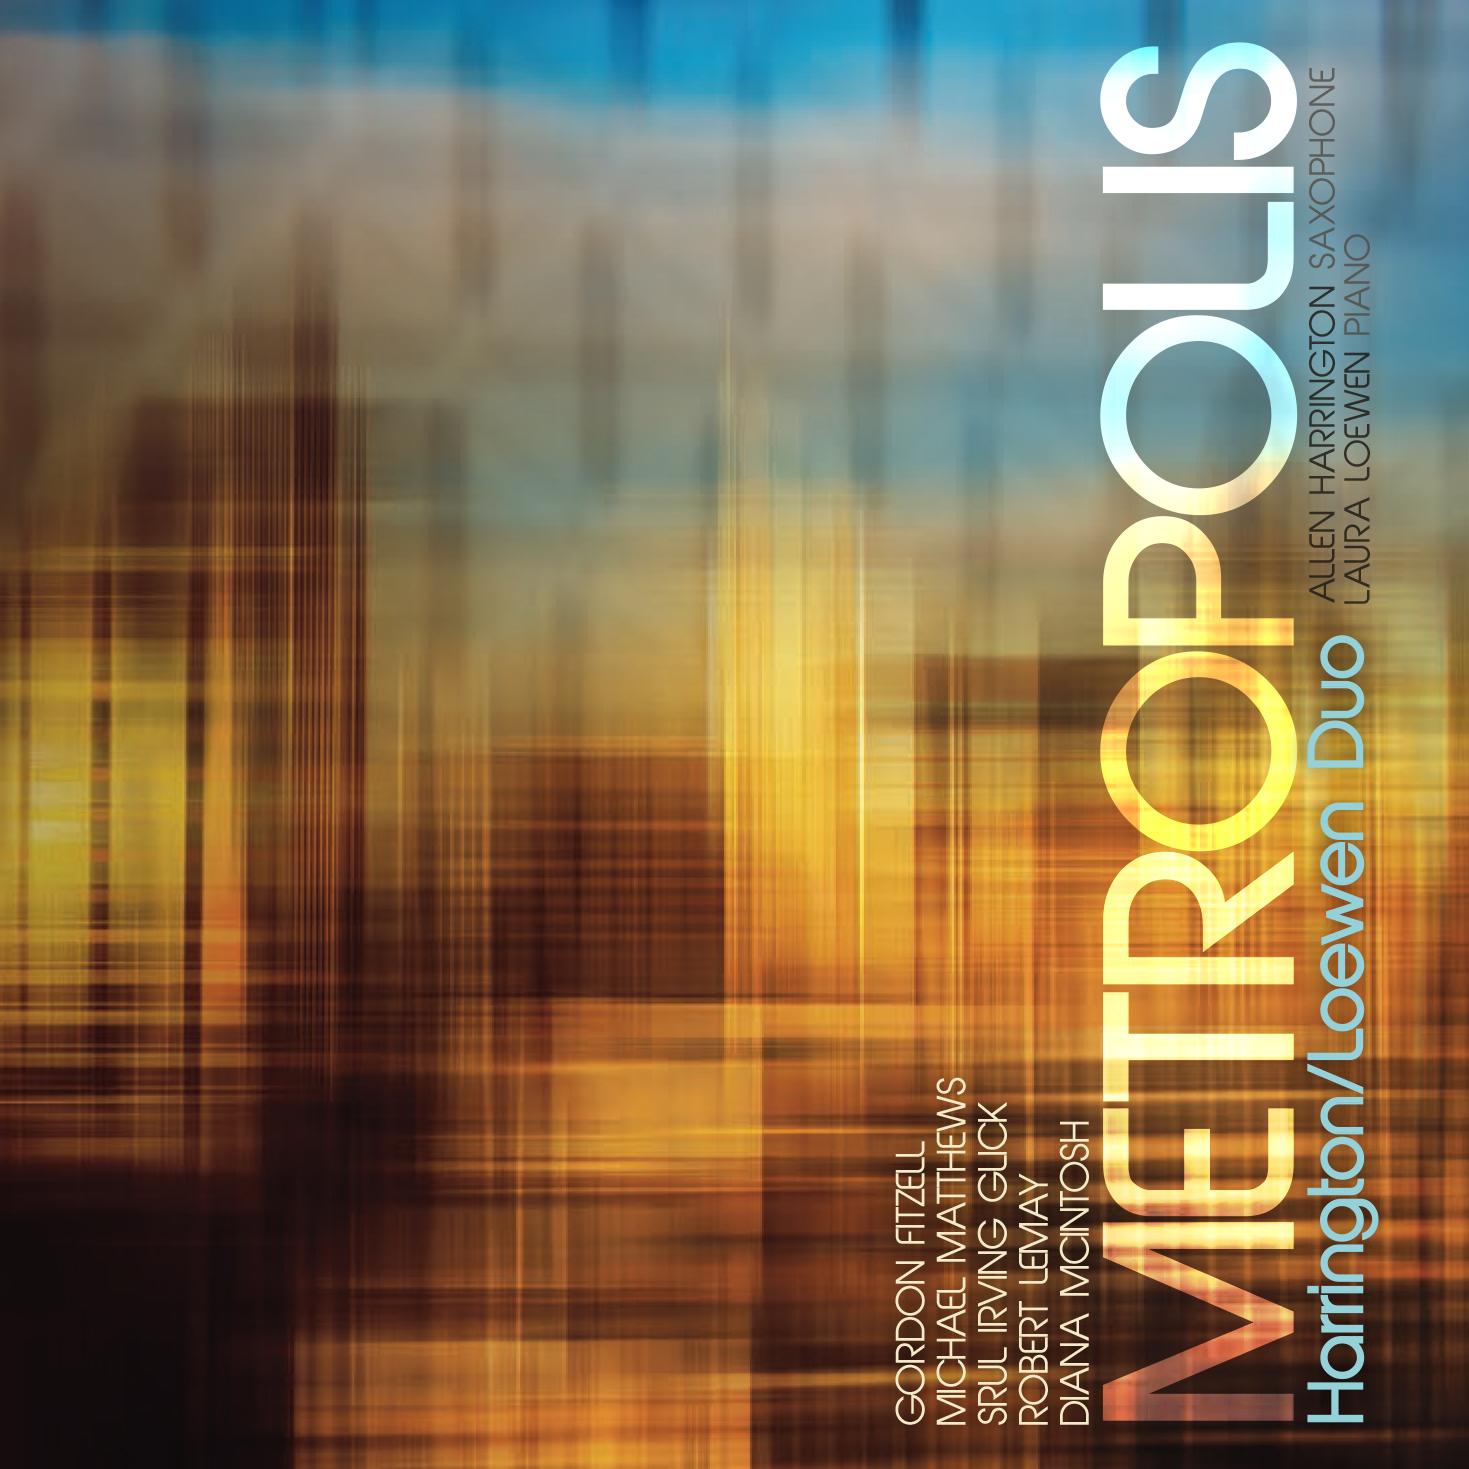 RR7889_Metropolis_frontcover